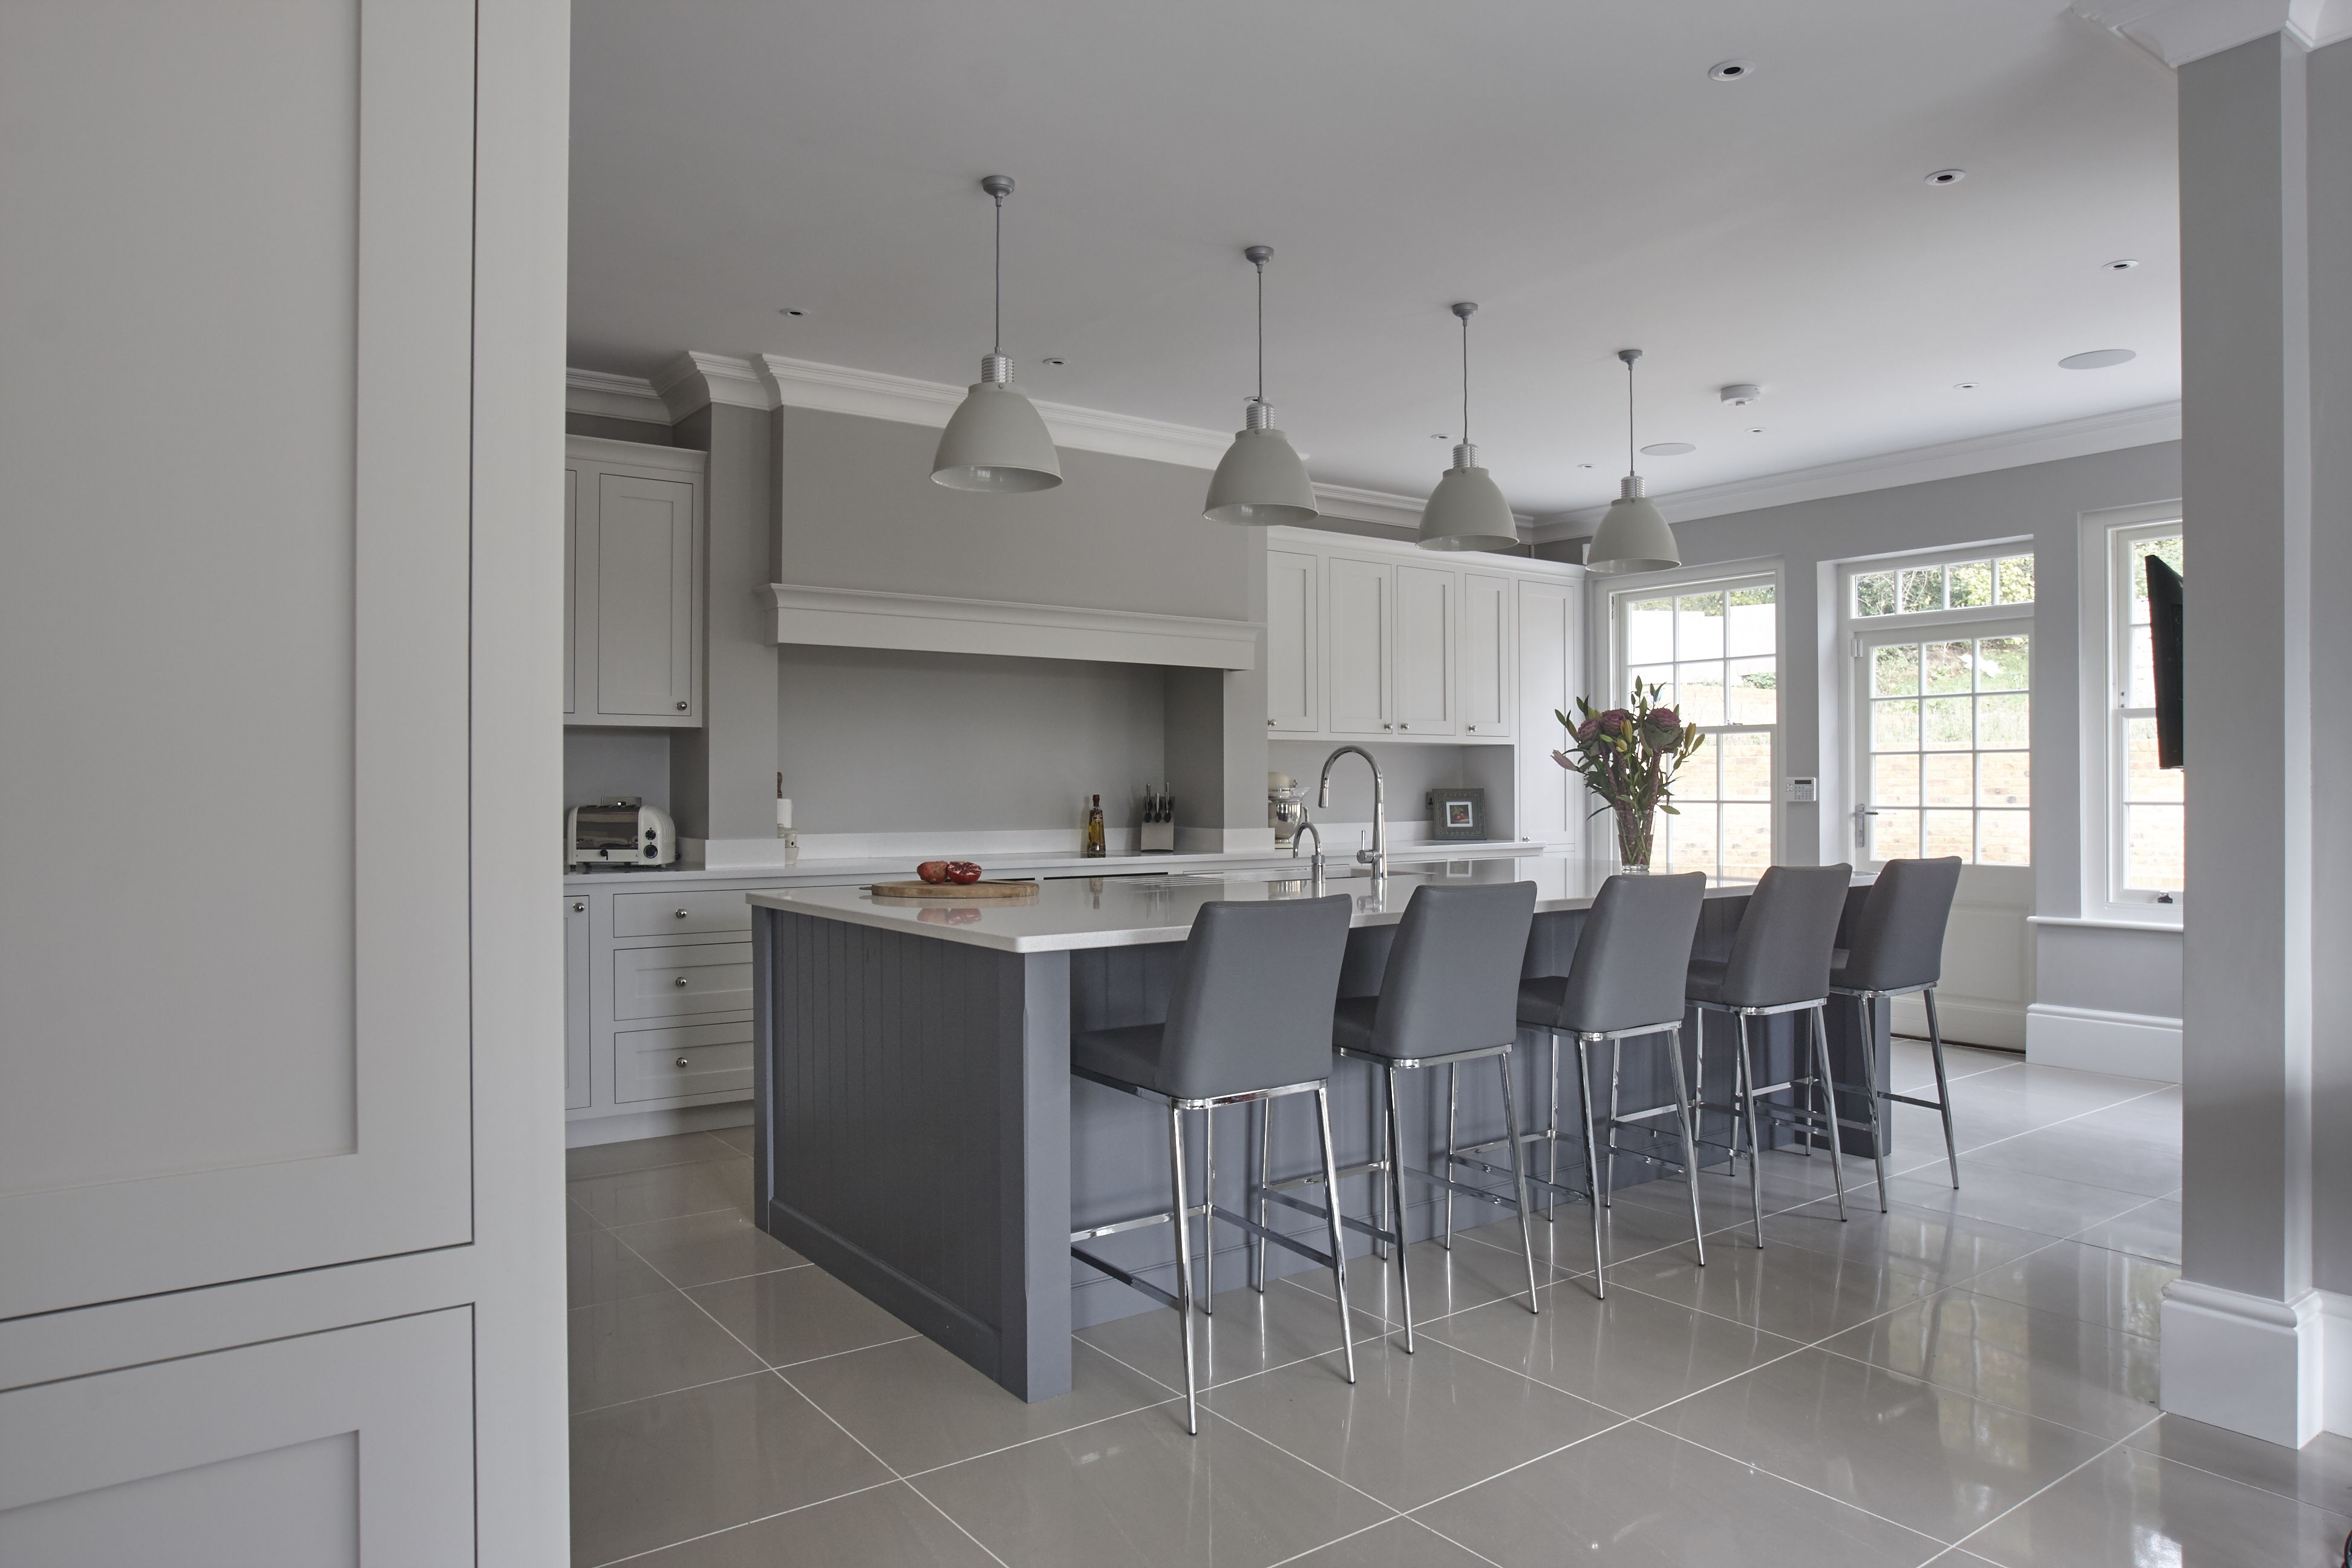 The island kitchen design - Beautiful Hand Painted Kitchen Seating On The Island Kitchen Dinner Shaker Kitchen